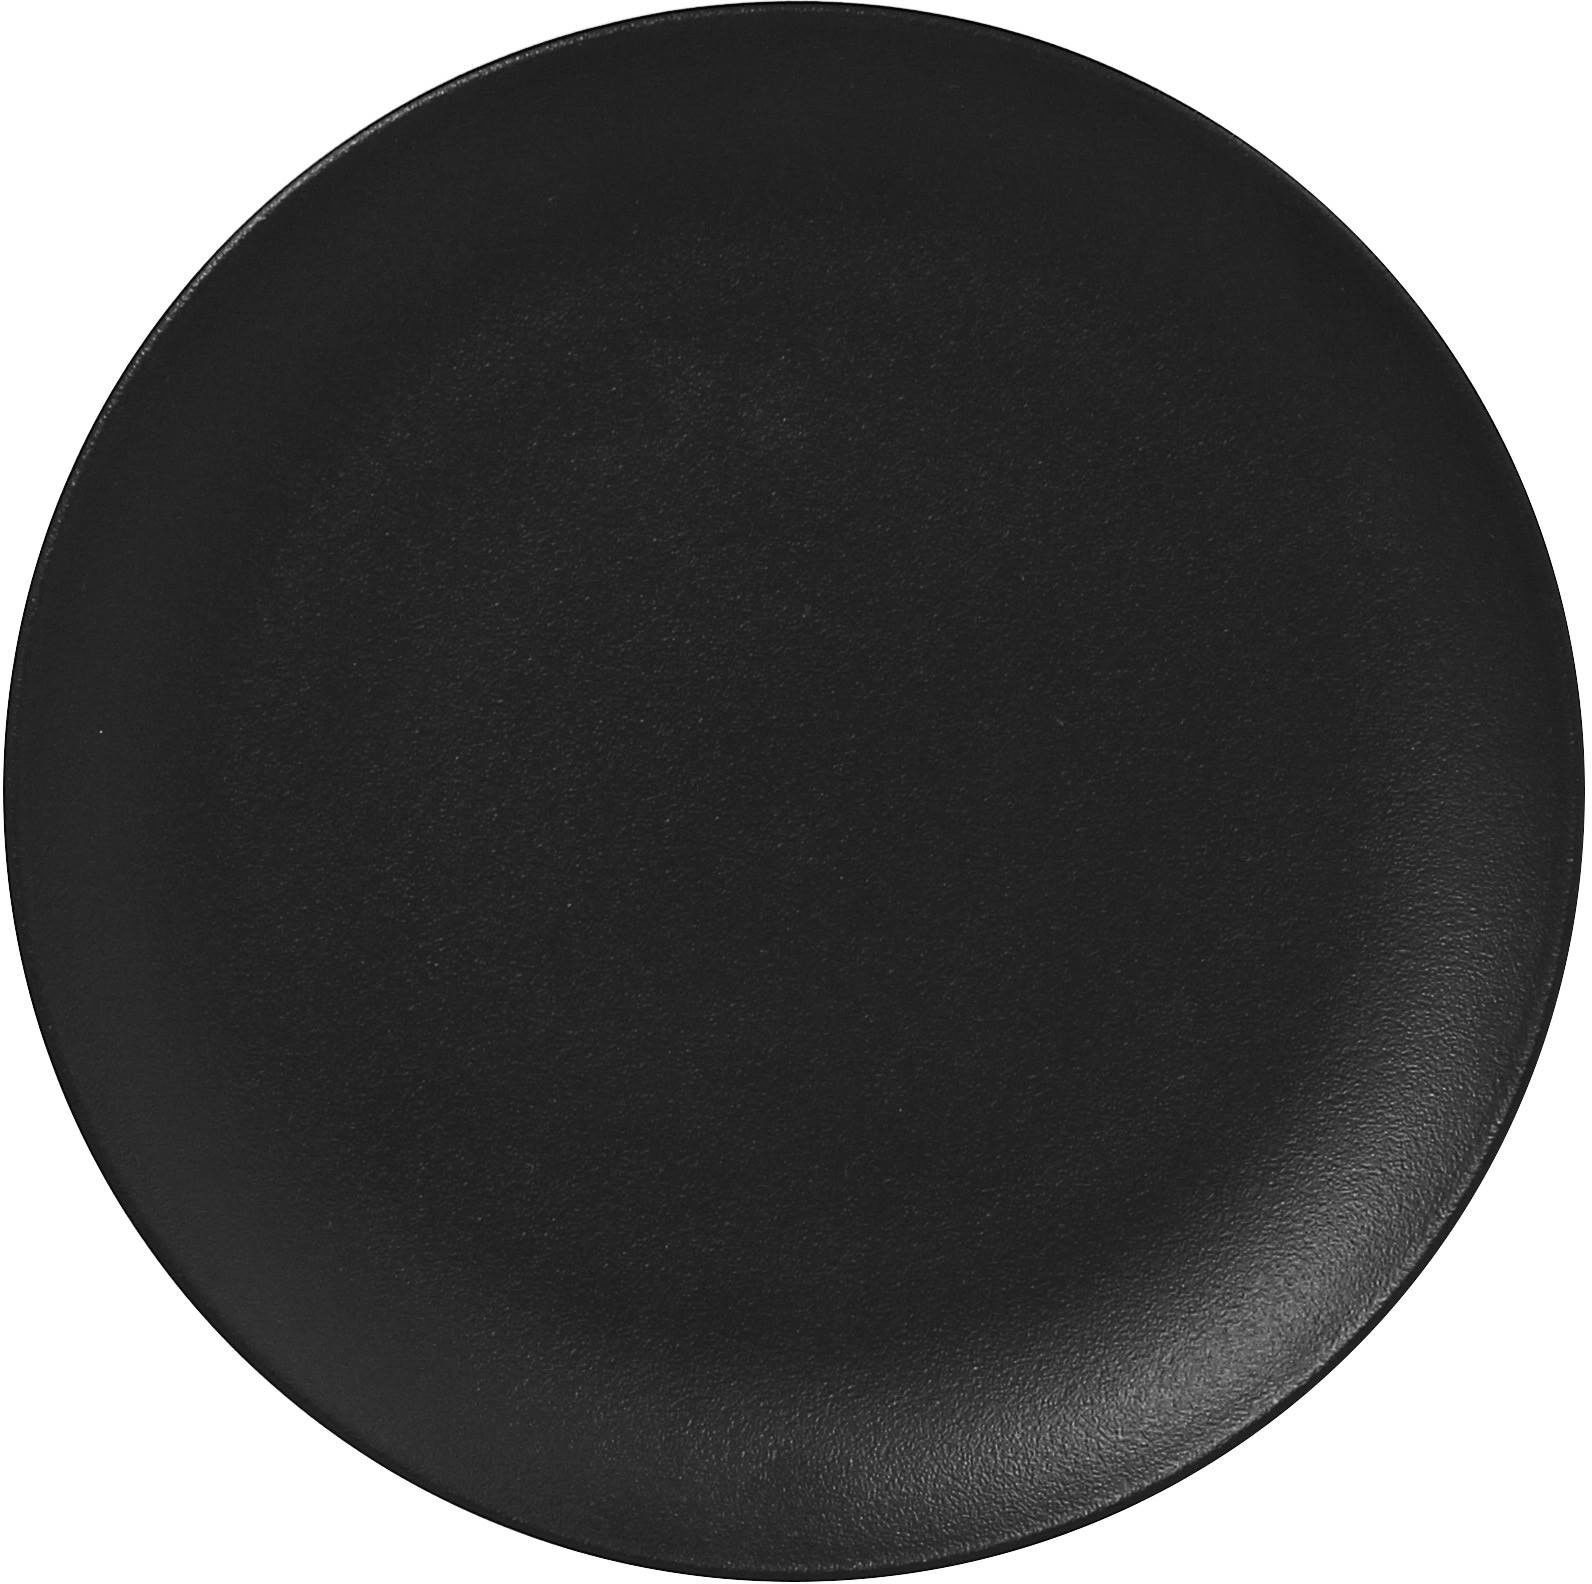 Talerz płaski okrągły 270 mm Nano Volcano czarny Neofusion porcelana Rak R-NFNNPR27BK-12